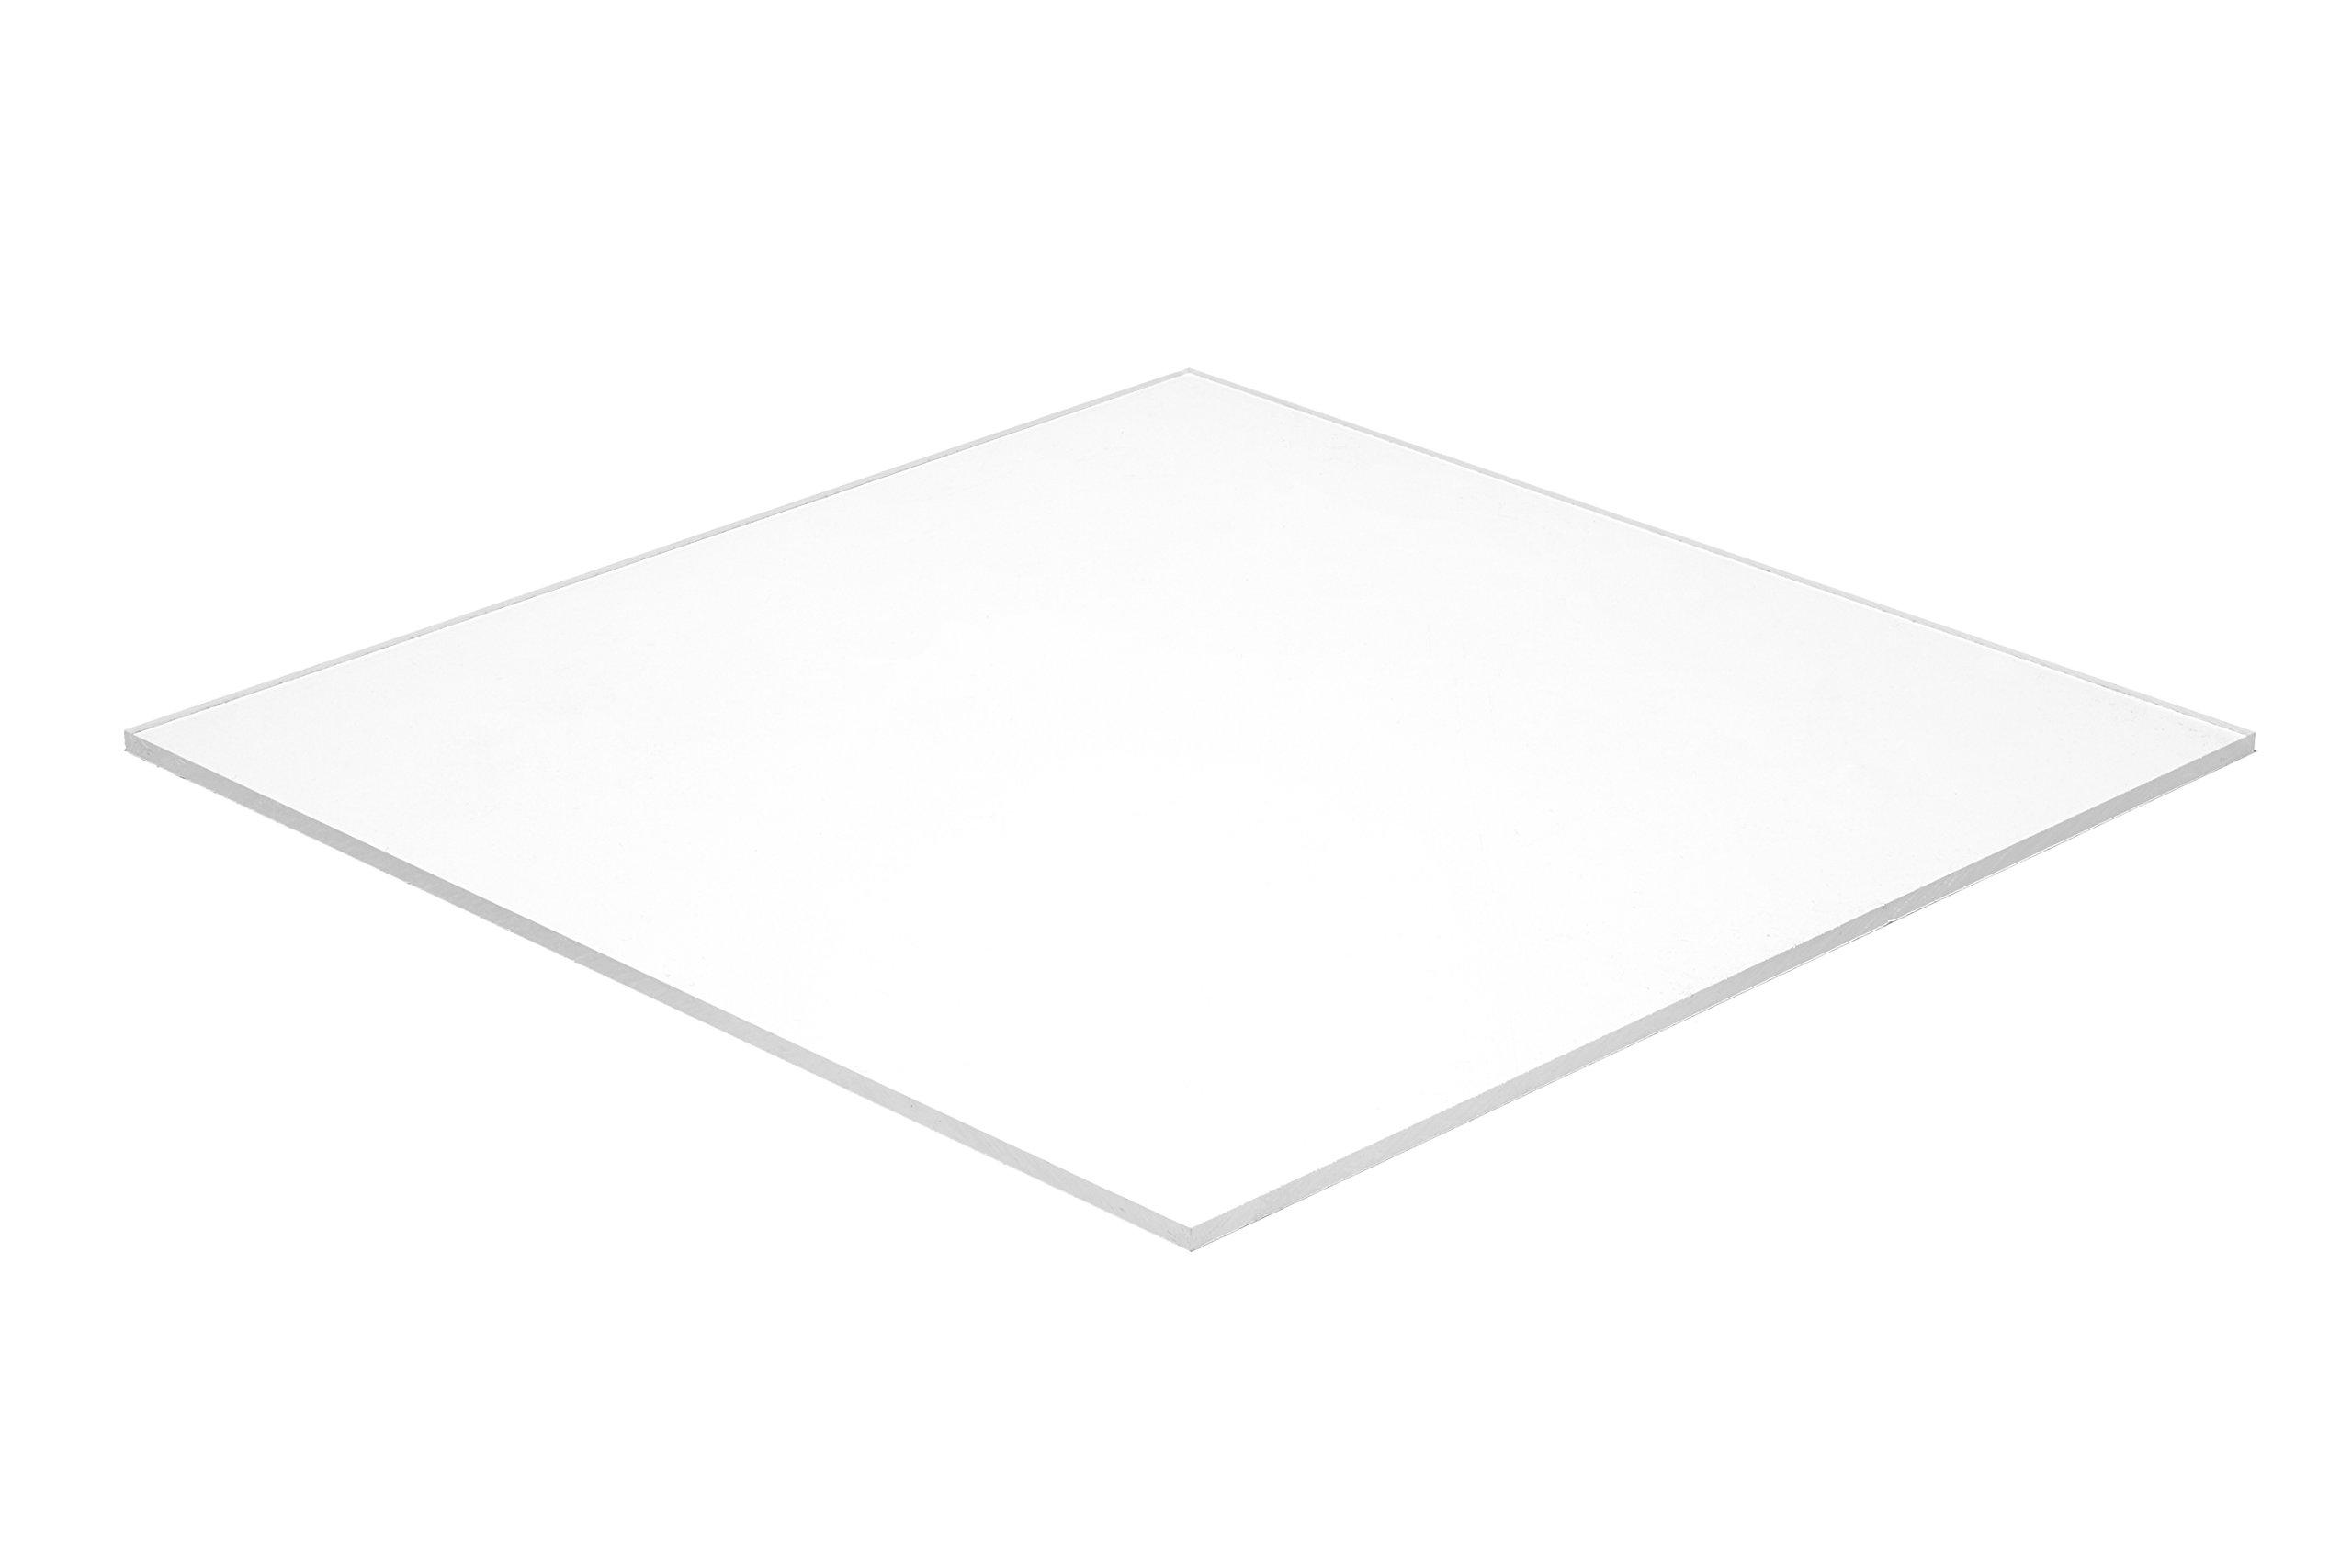 Falken Design WT2447-1-8/2436 Acrylic White Sheet, Translucent 55%, 24'' x 36'', 1/8'' Thick by Falken Design Corporation